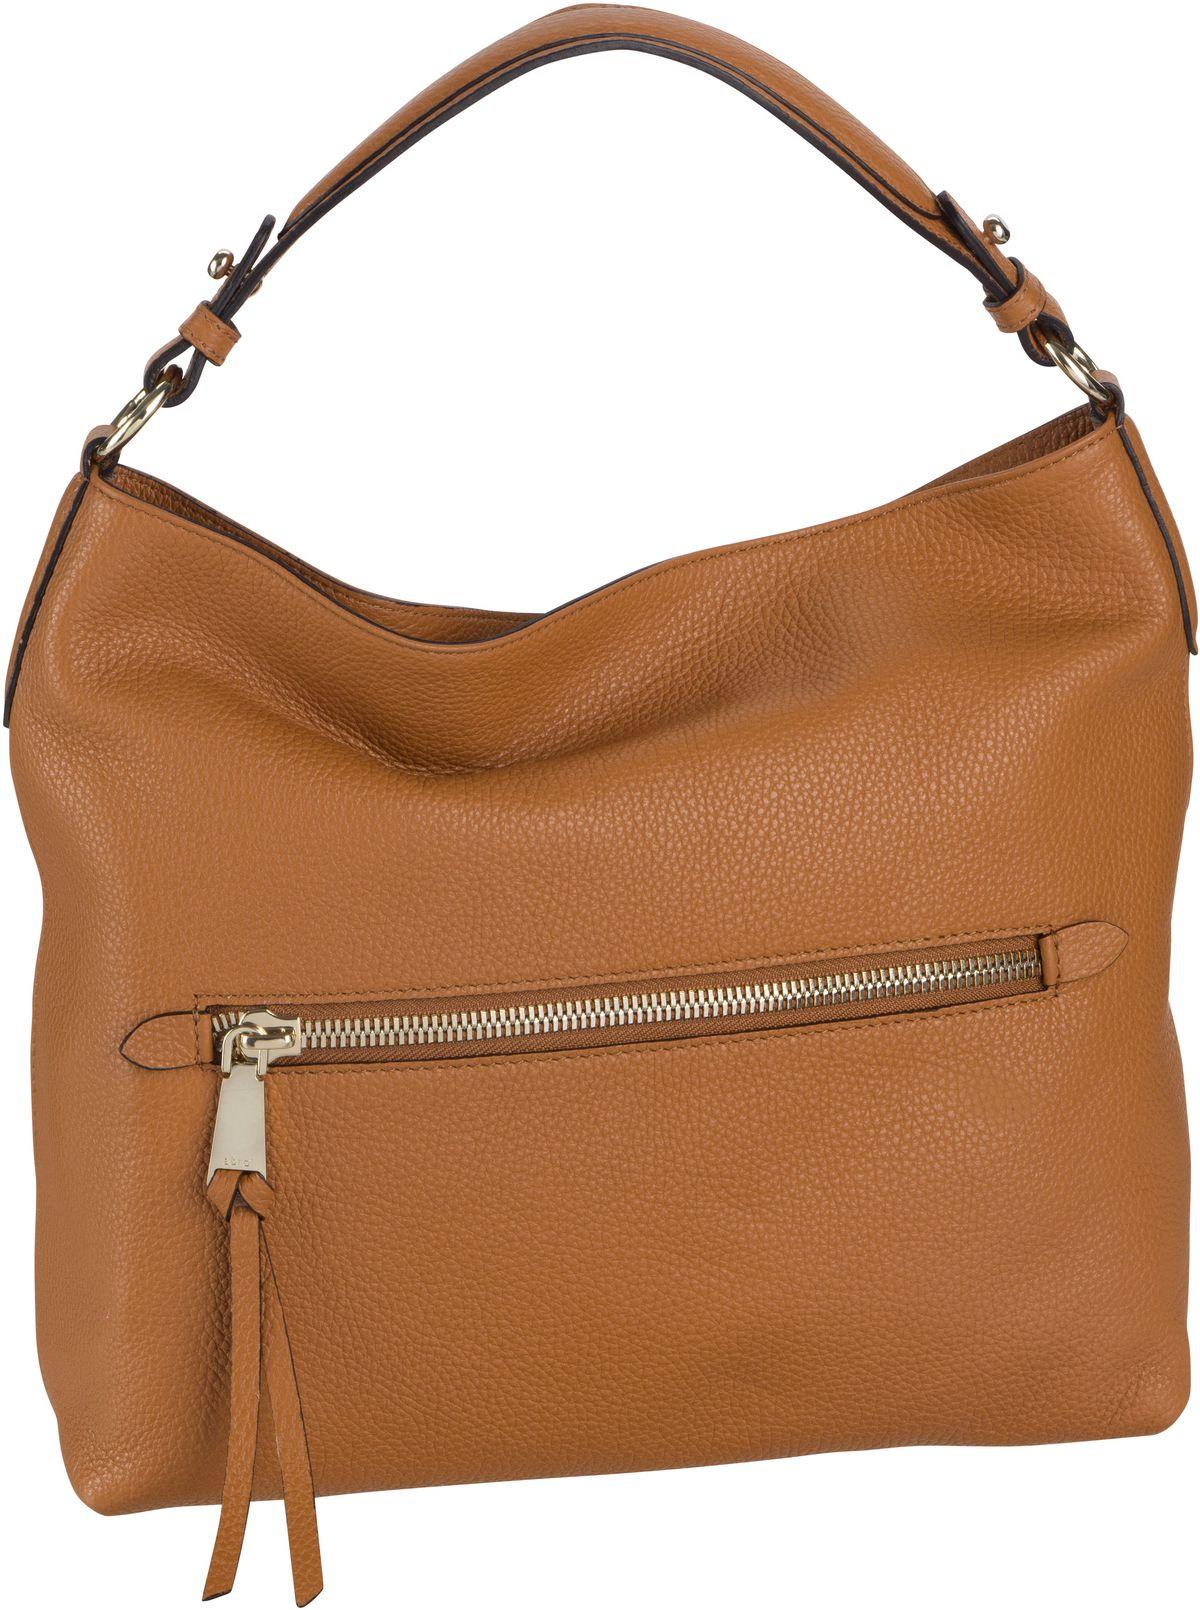 Handtasche Calf Adria 28517 Cuoio